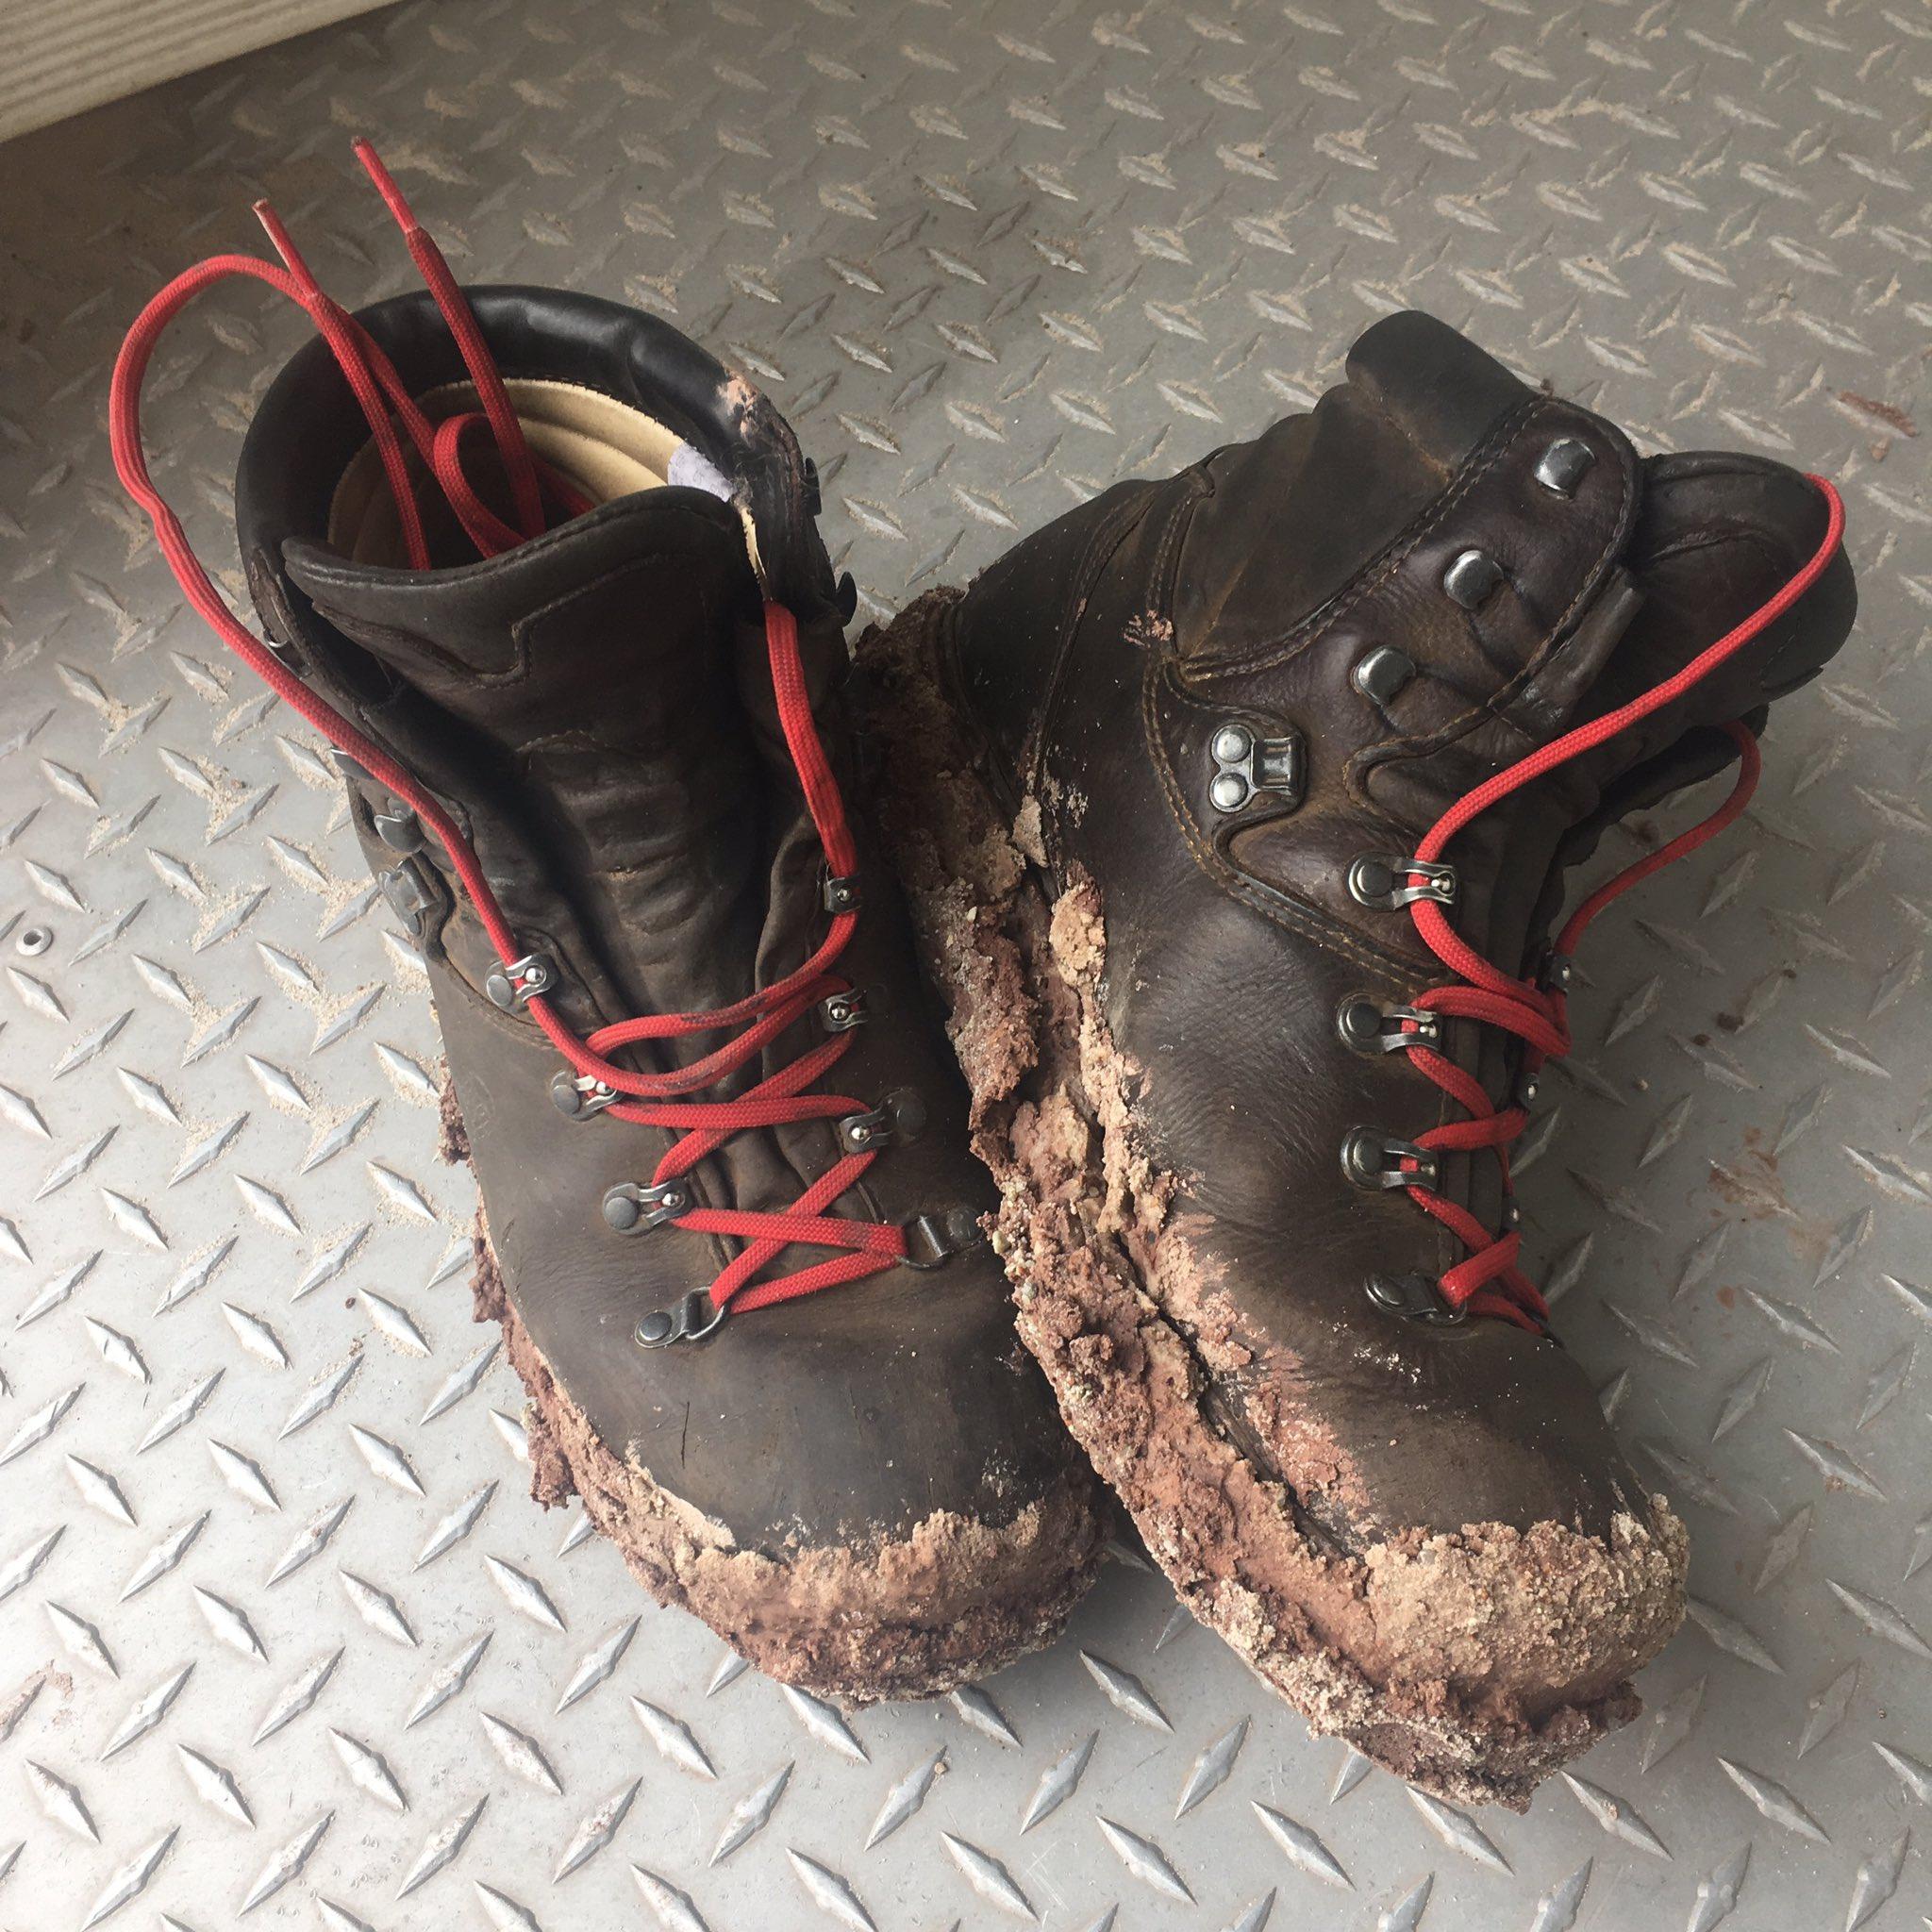 Boots on MDRS, Utah, USA. Photograph: Dan Richards